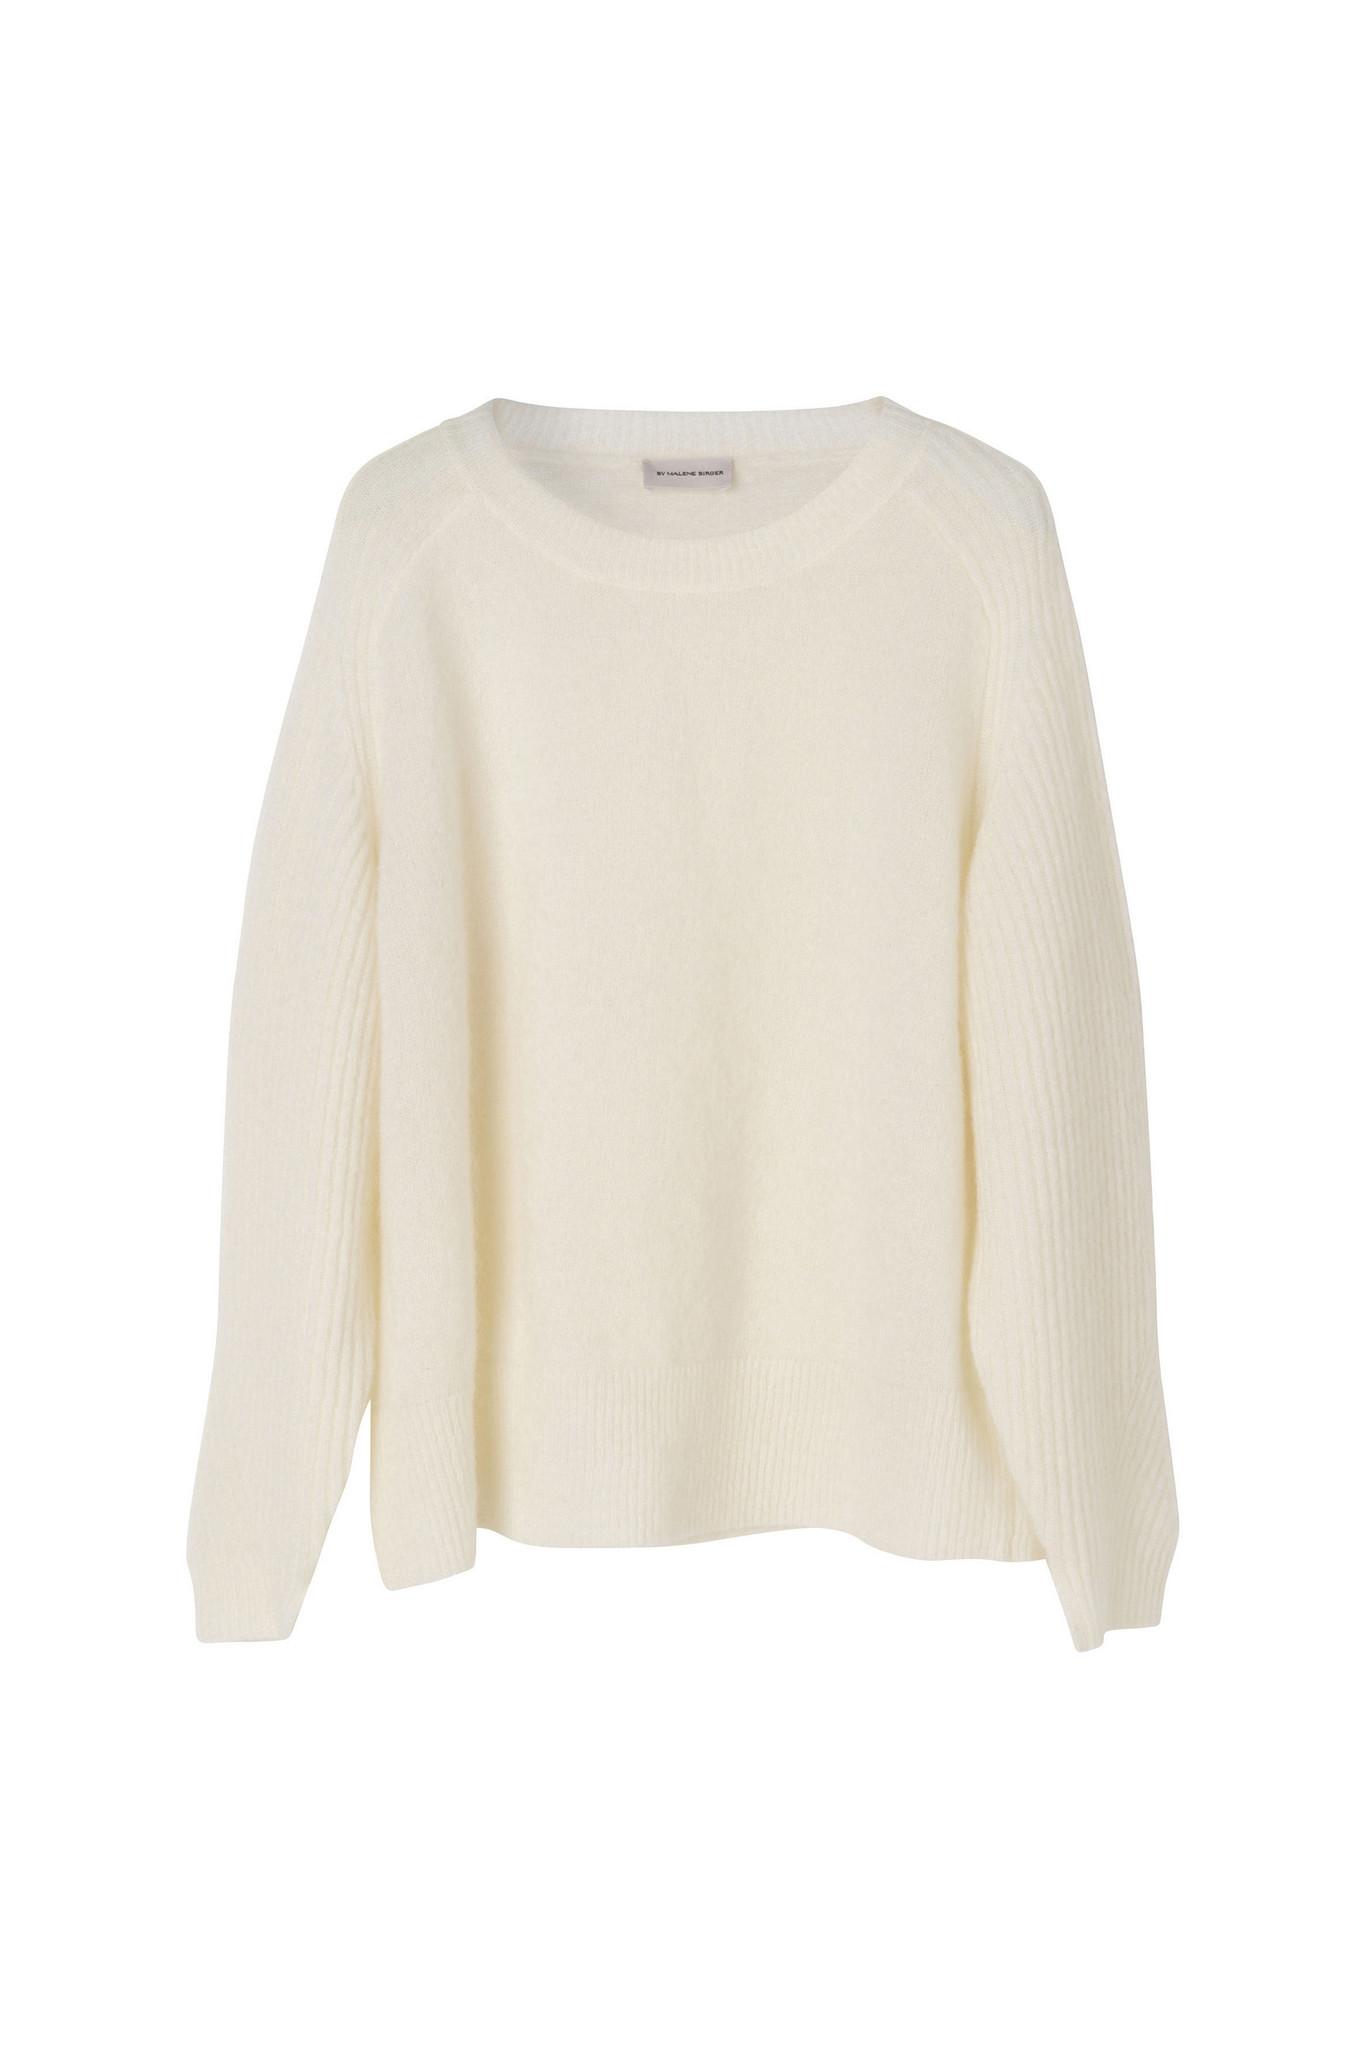 Ana Pullover - Soft White-1